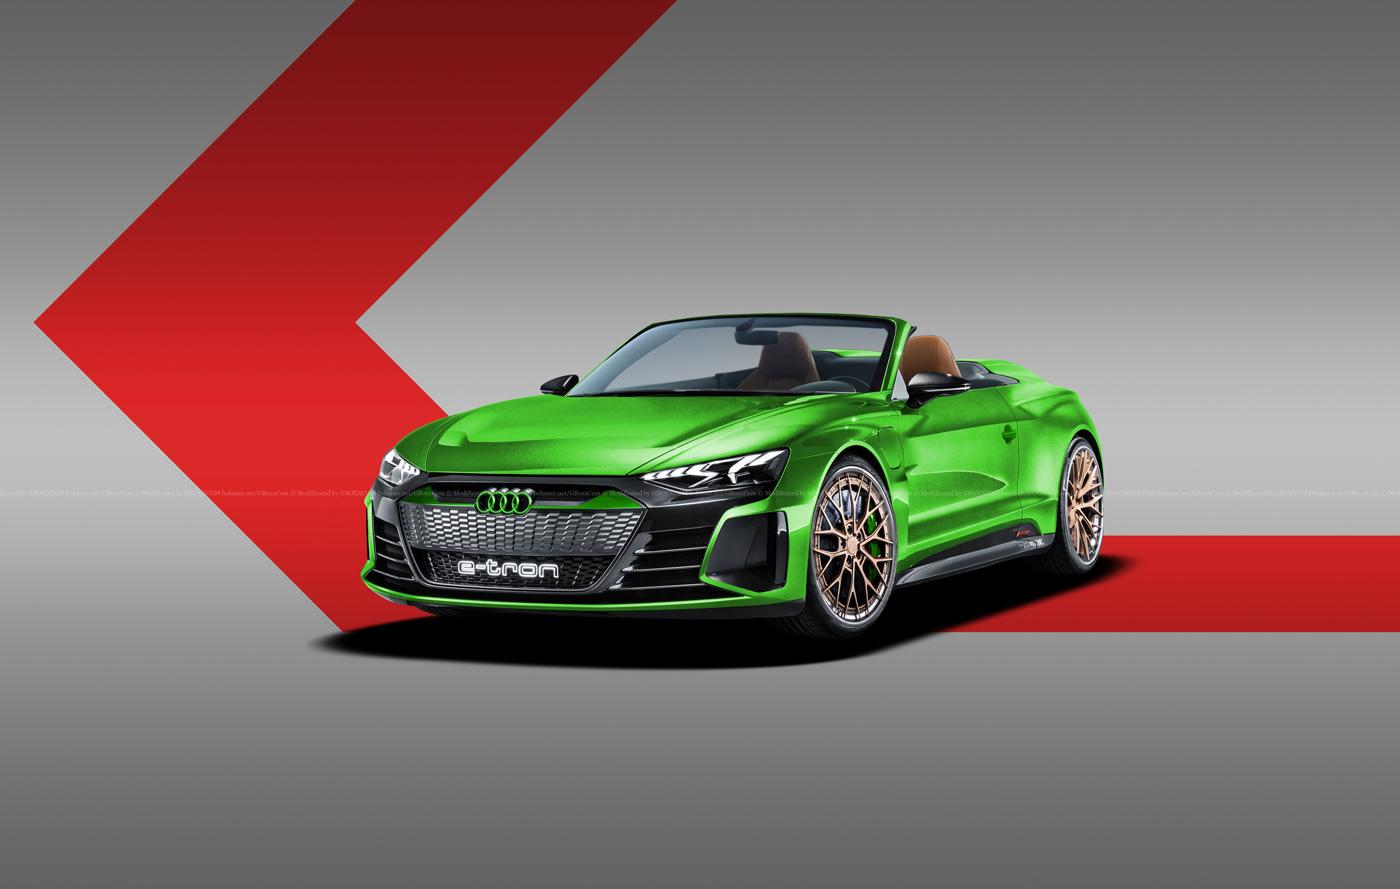 Audi E-Tron GT Spyder, E-Tron GT Wagon, E-Tron GT Coupe Renderings (5)